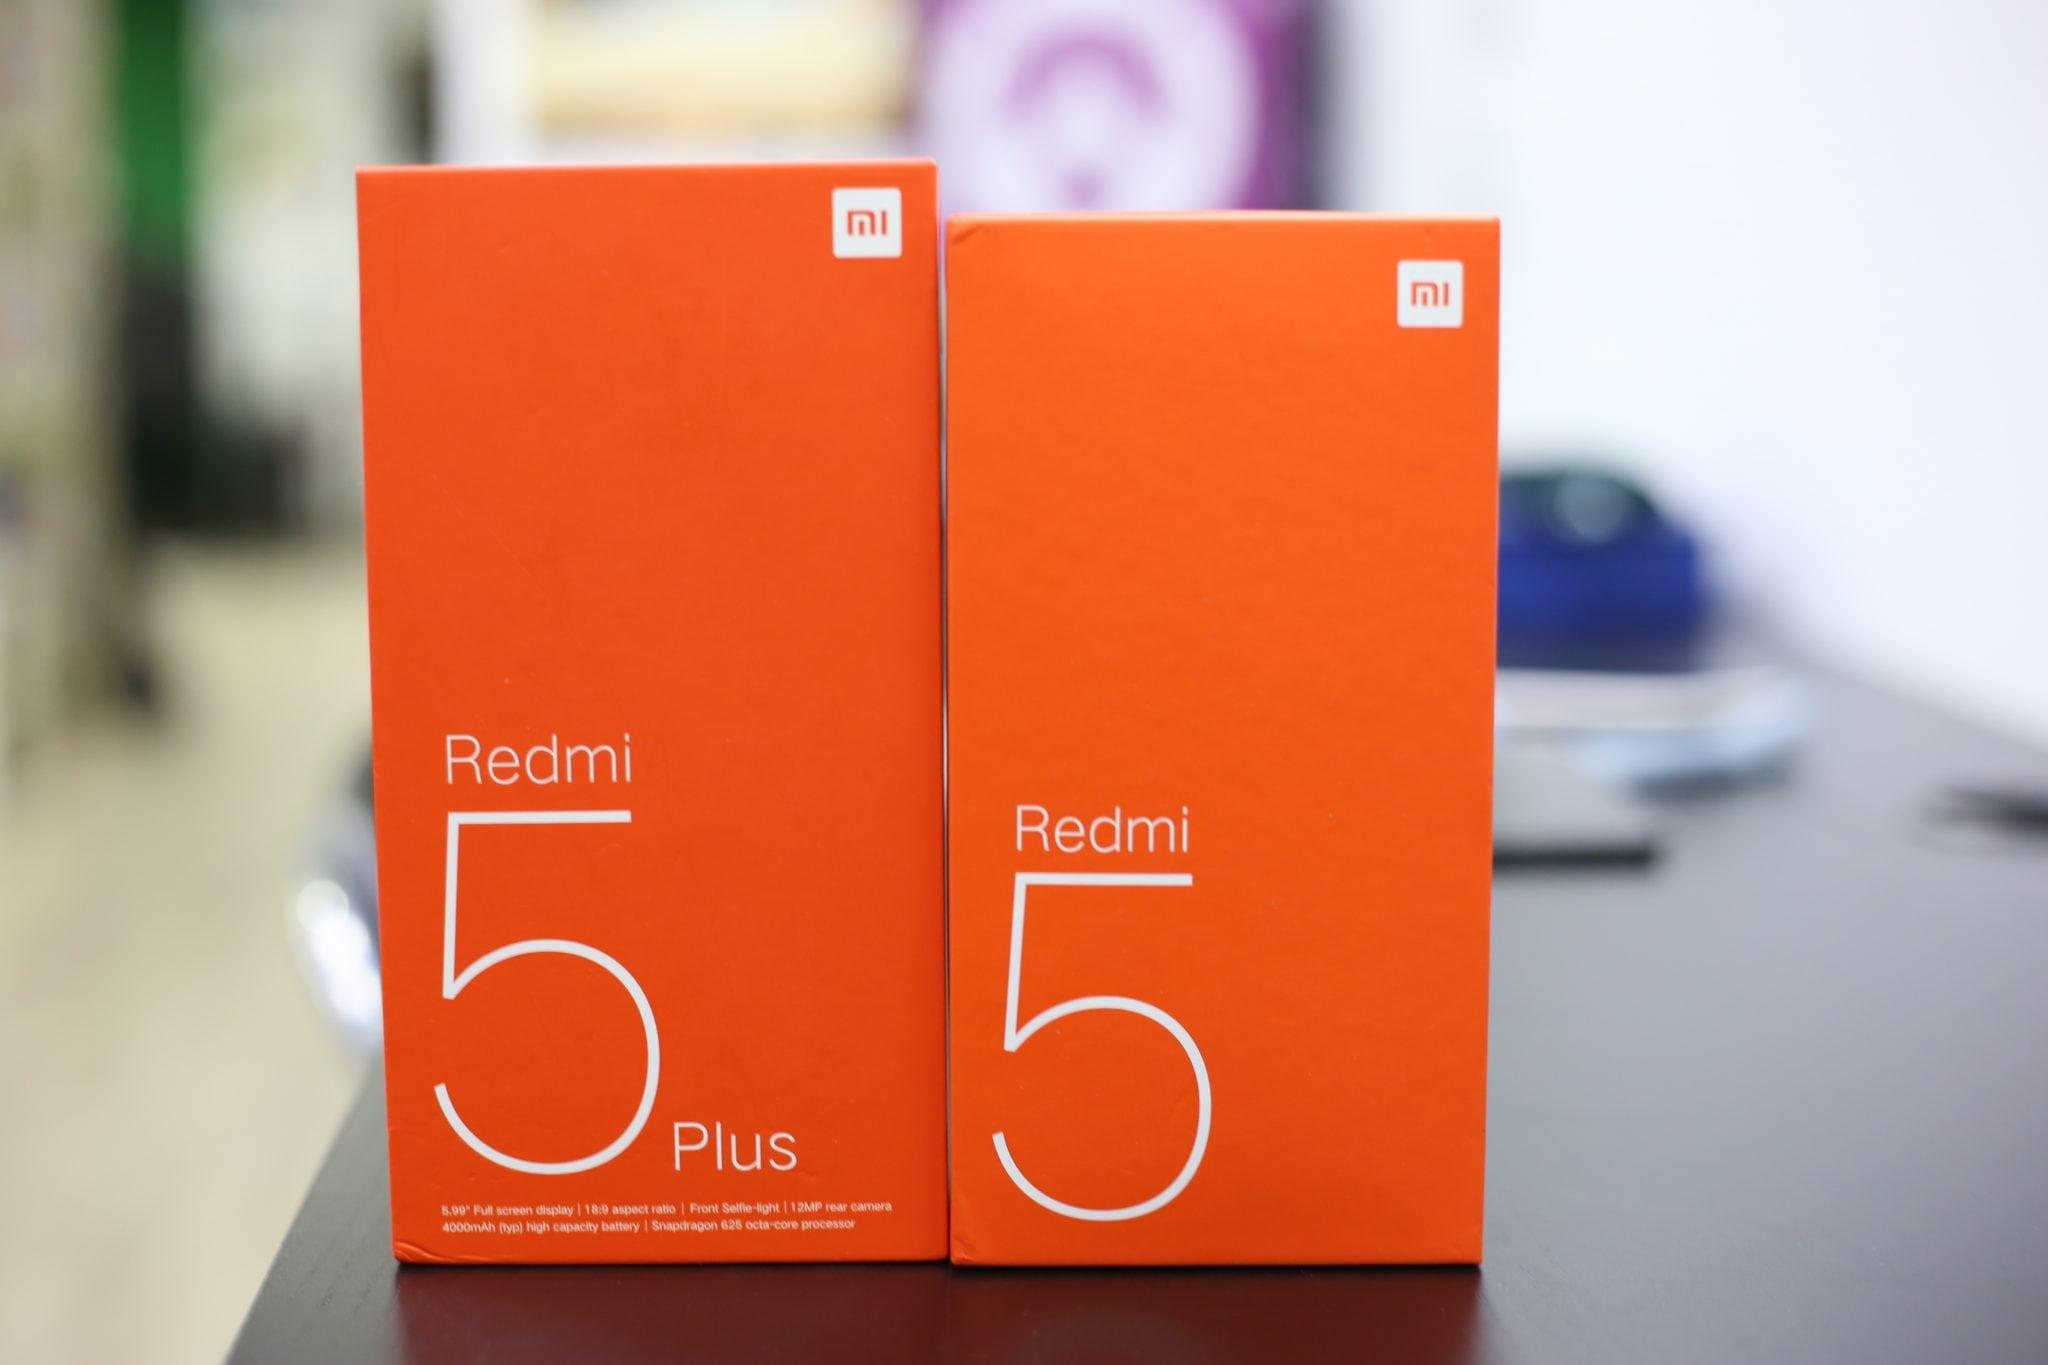 Xiaomi Redmi 5 & Redmi 5 Plus (13)